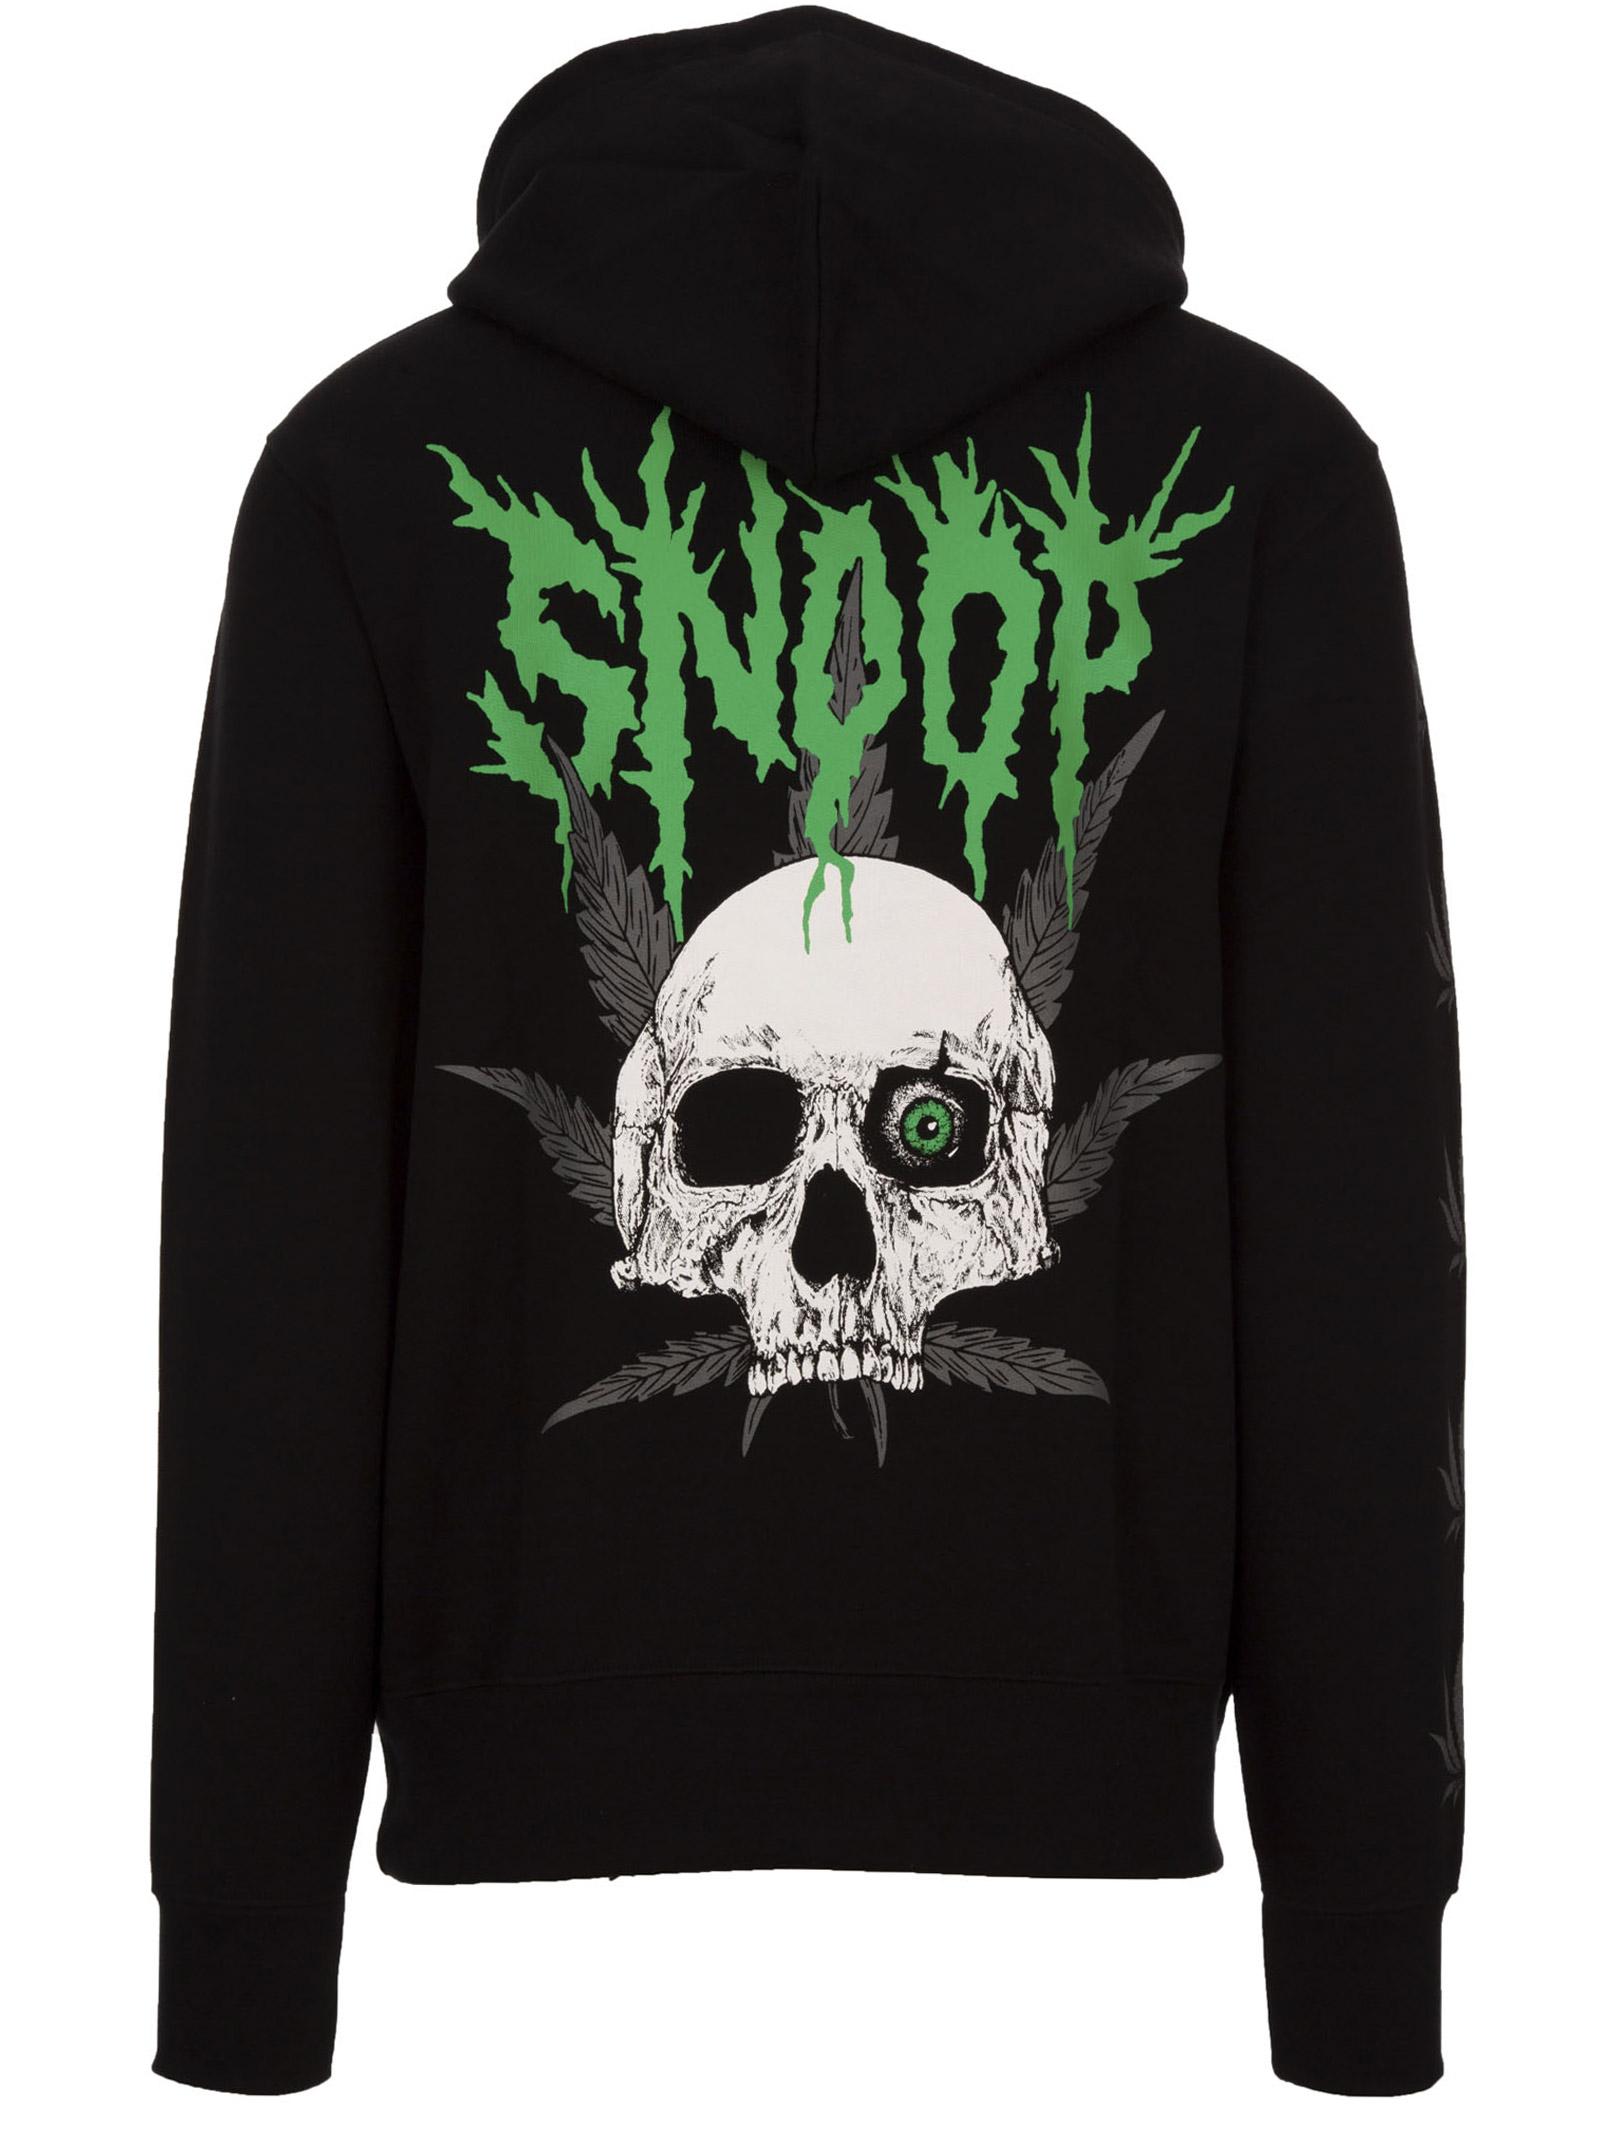 World Corp sweatshirt